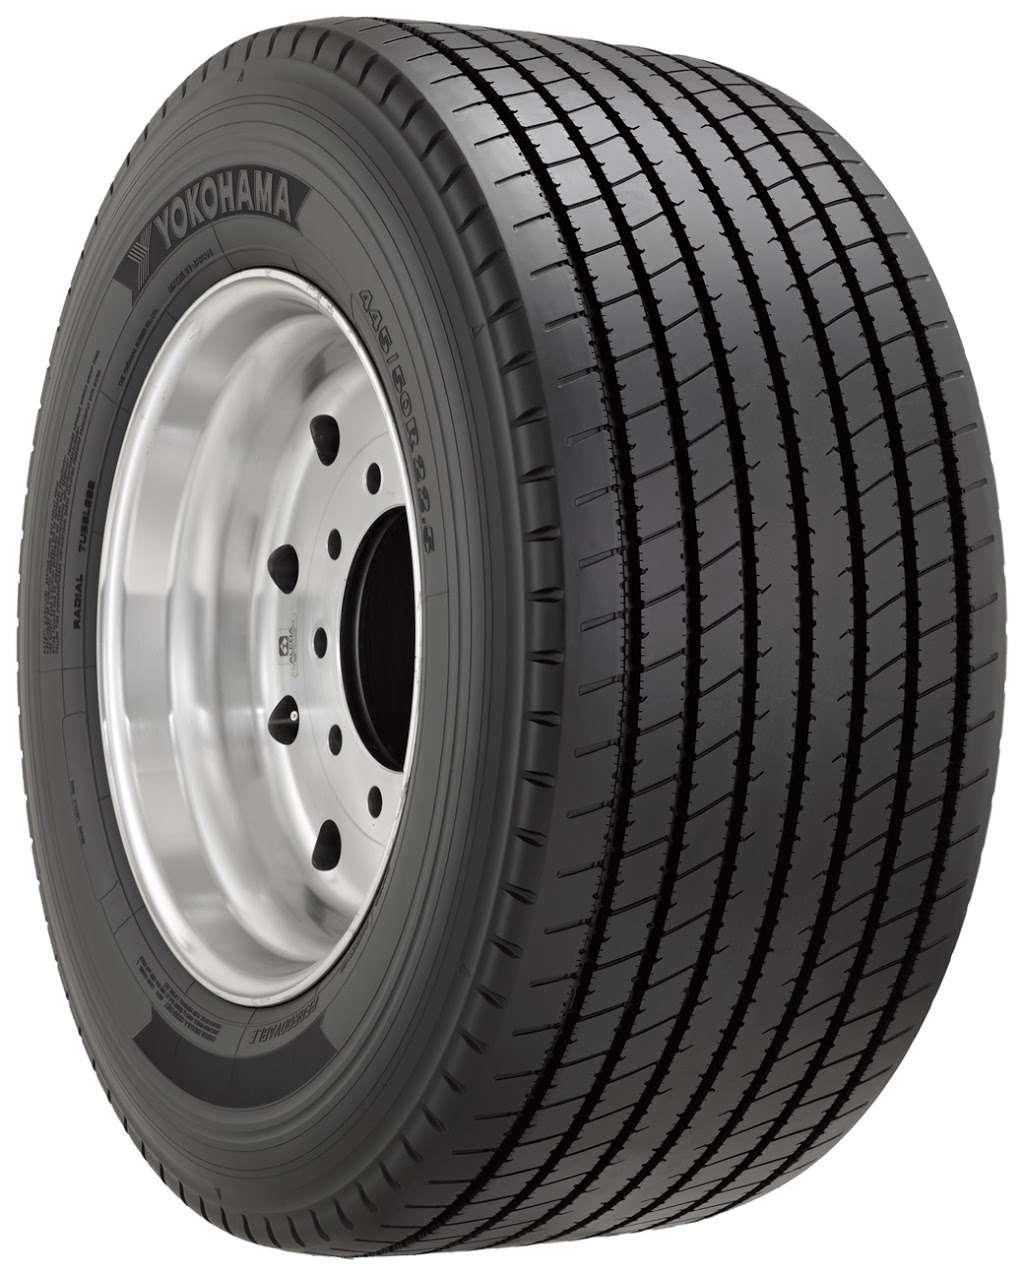 AltaTire, YOKOHAMA Commercial Tire Dealer - Roadside Semi Truck  - car repair  | Photo 10 of 10 | Address: 3123 US-175 Frontage Rd, Seagoville, TX 75159, USA | Phone: (888) 788-9643